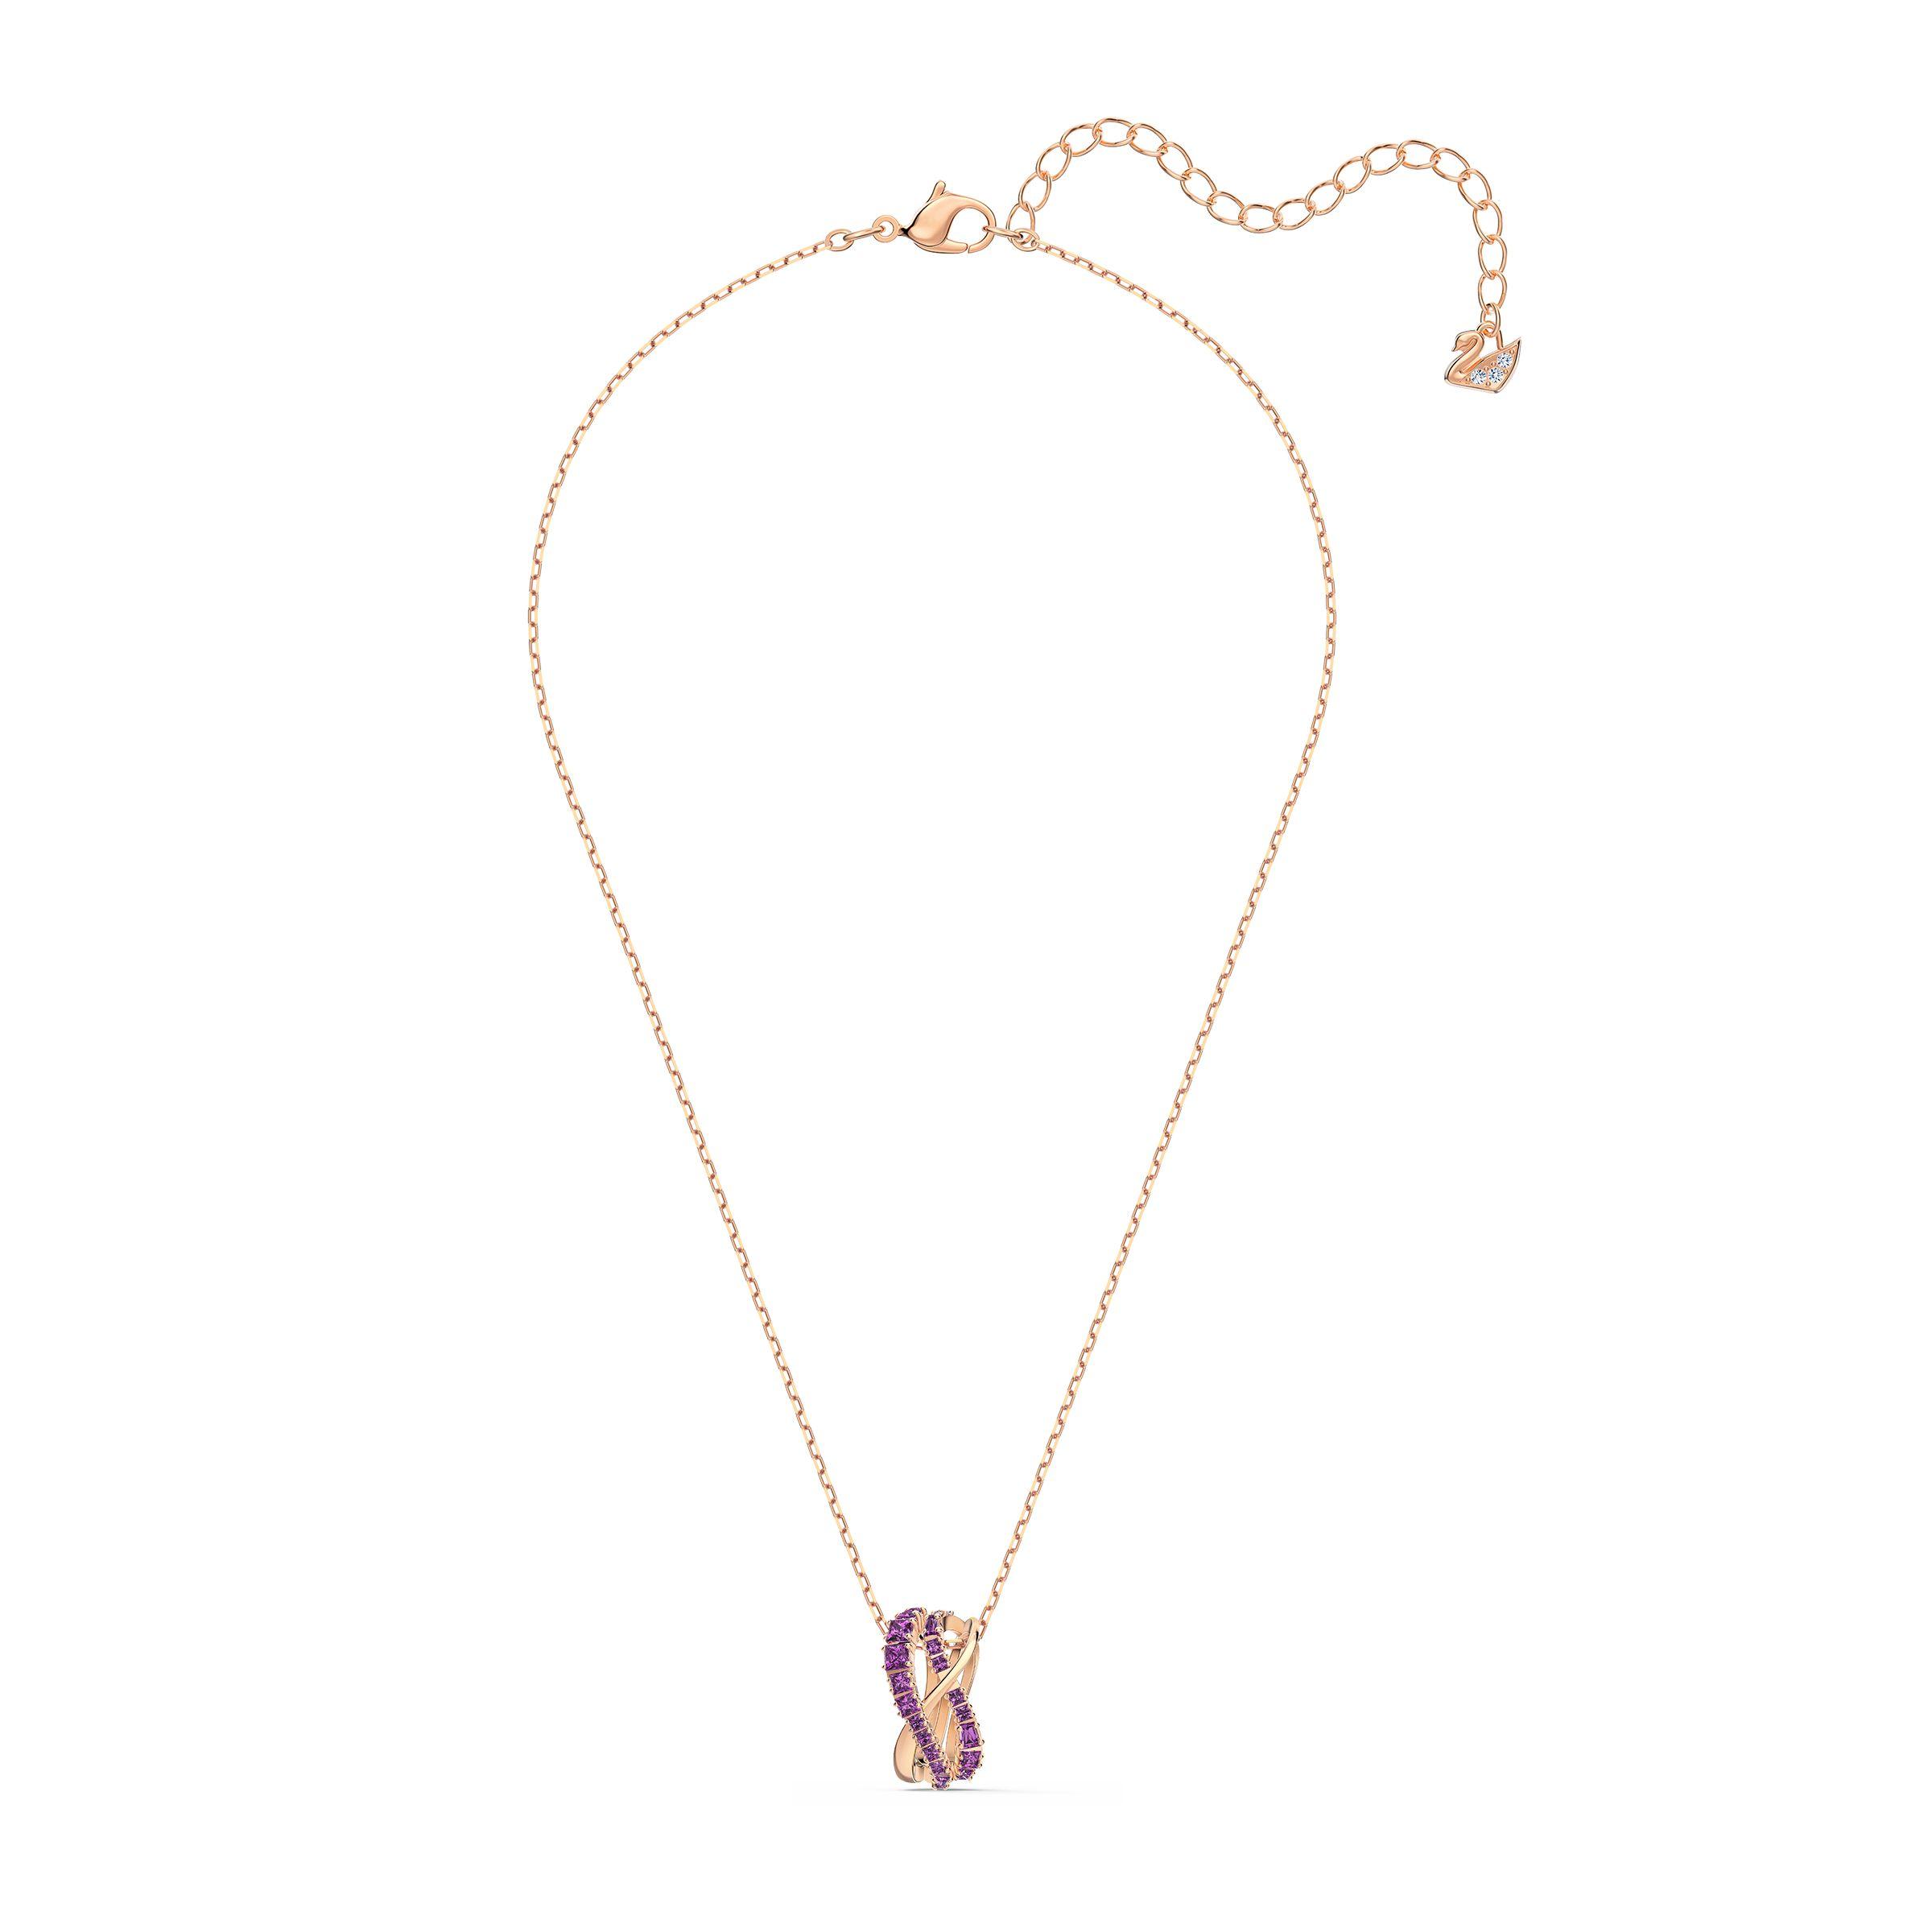 Pendentif Twist Rows, violet, métal doré rose, Swarovski